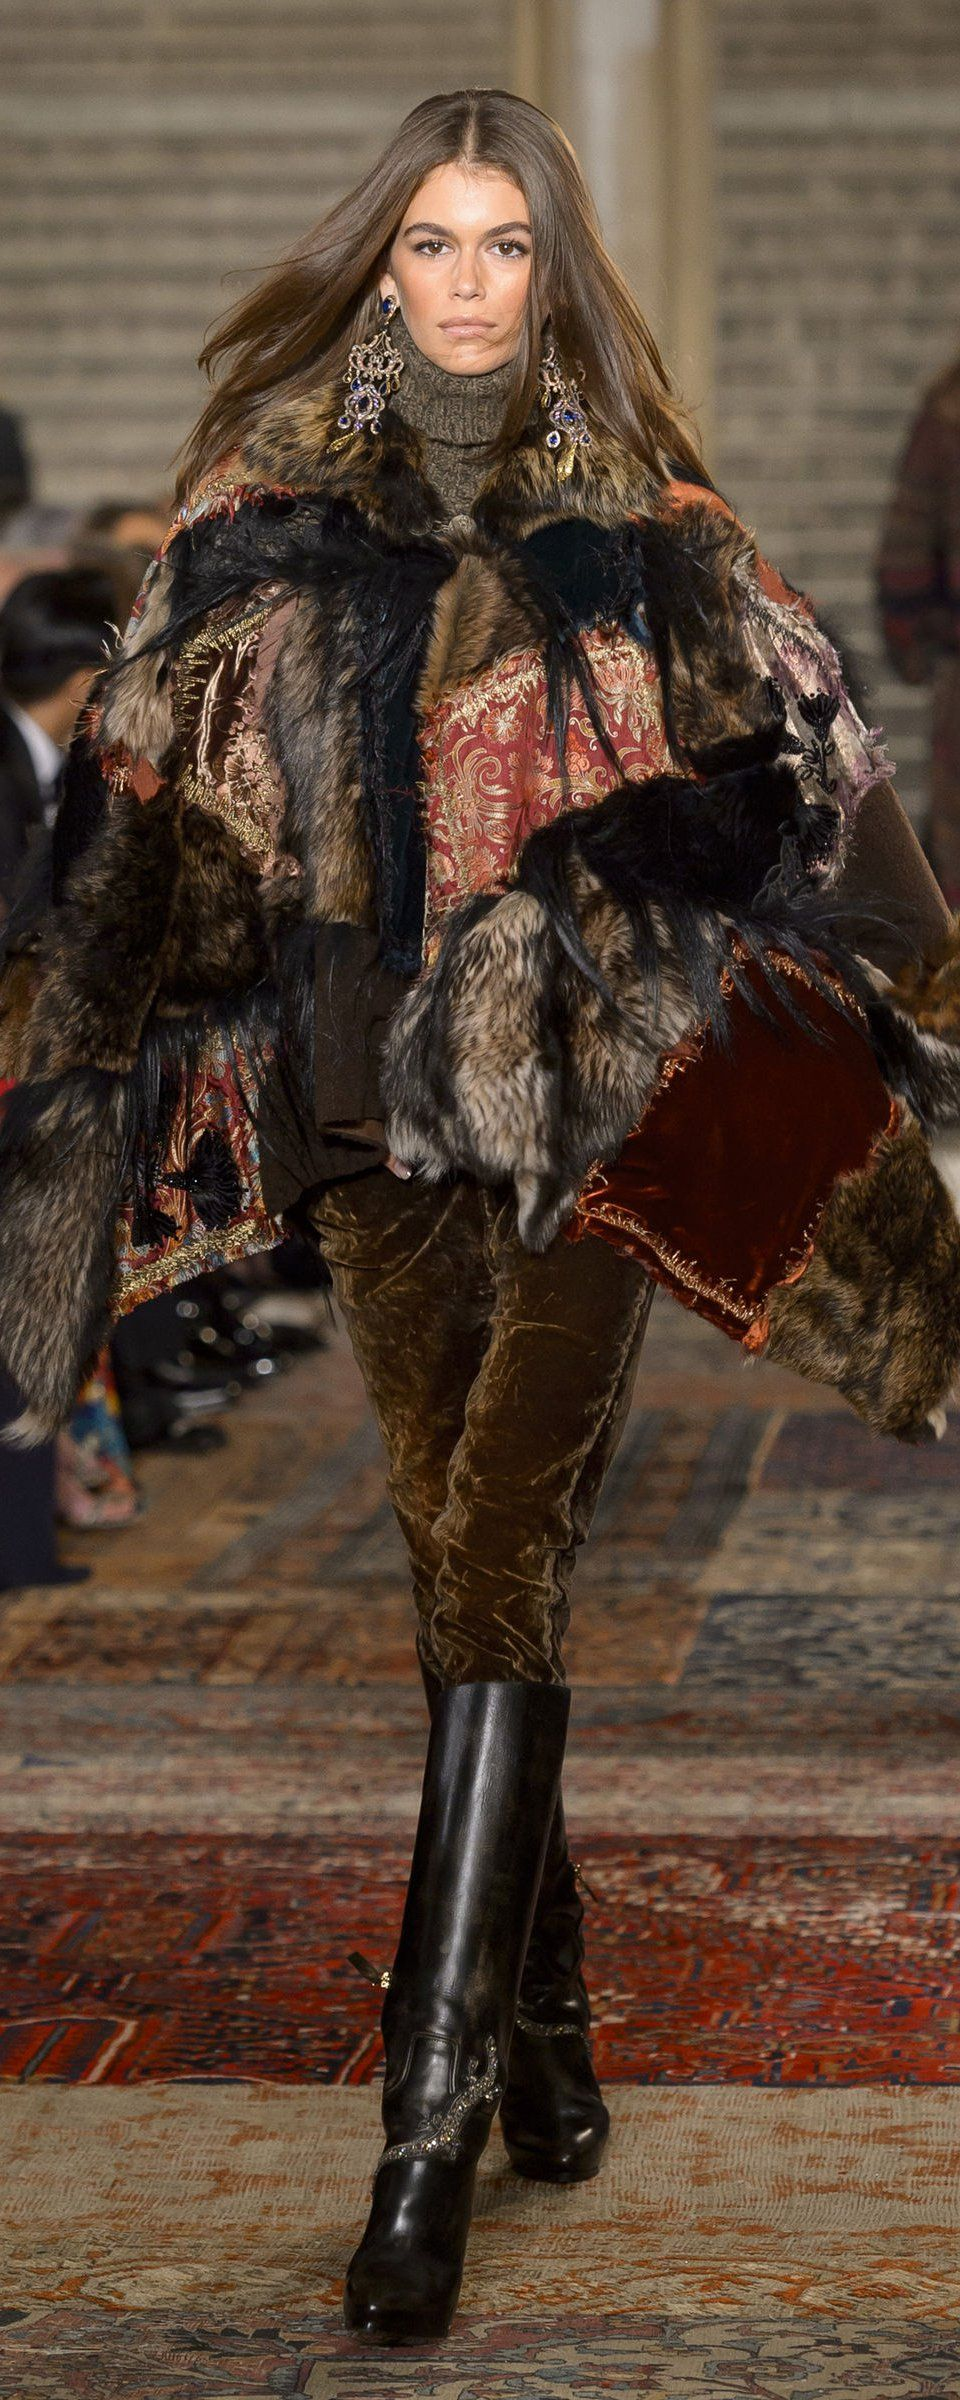 Ralph Lauren Fall-winter 2018-2019 - Ready-to-Wear   Tendance   Pinterest    Haute couture, Mode et Couture 8ee5f35aea5